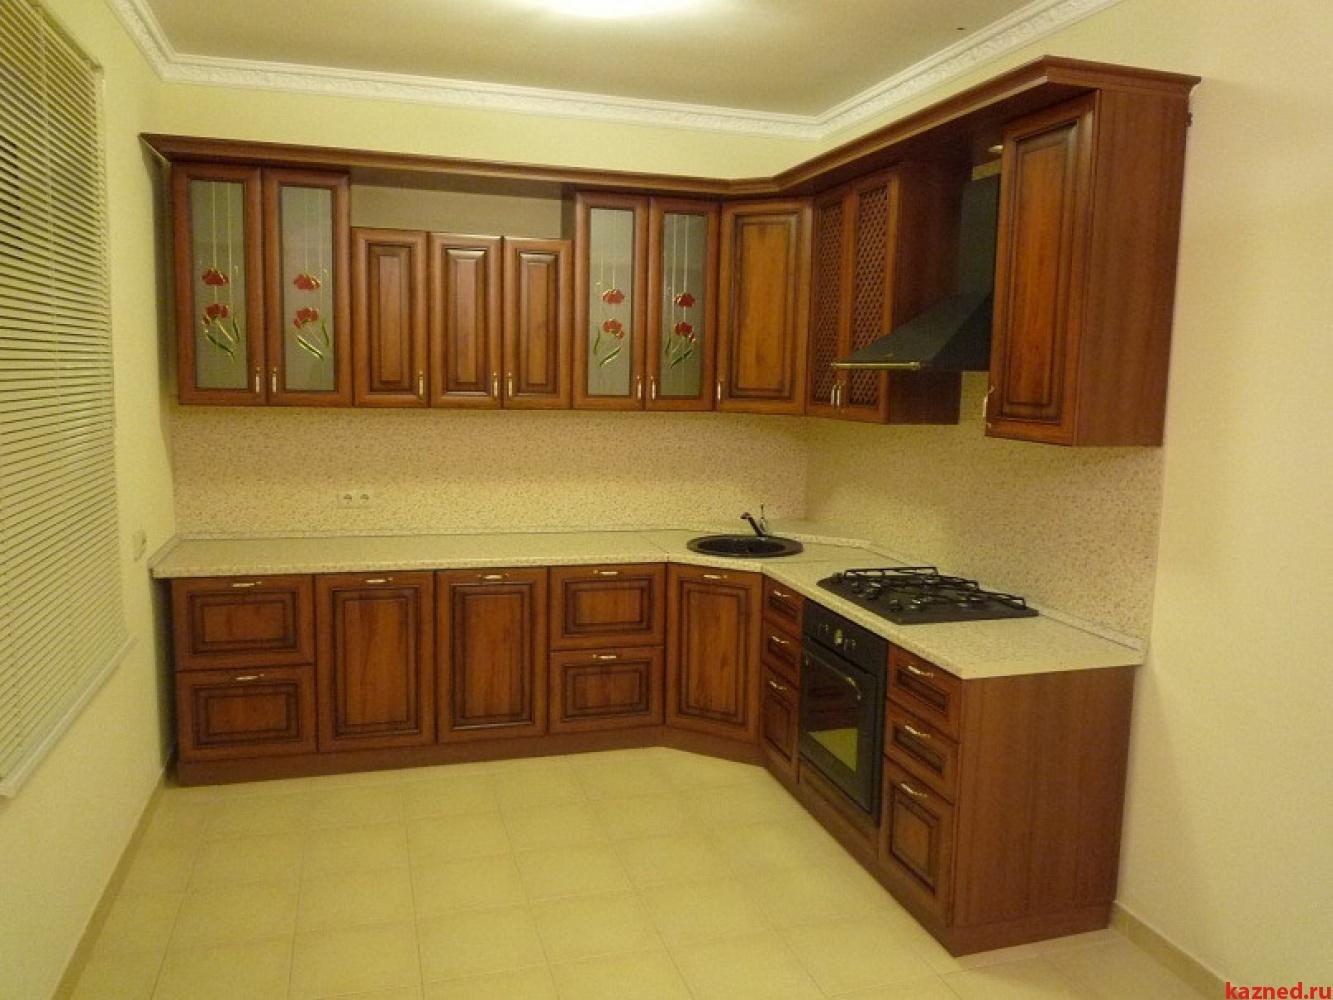 Продажа дом ул.Дорожная, 250 м2  (миниатюра №6)